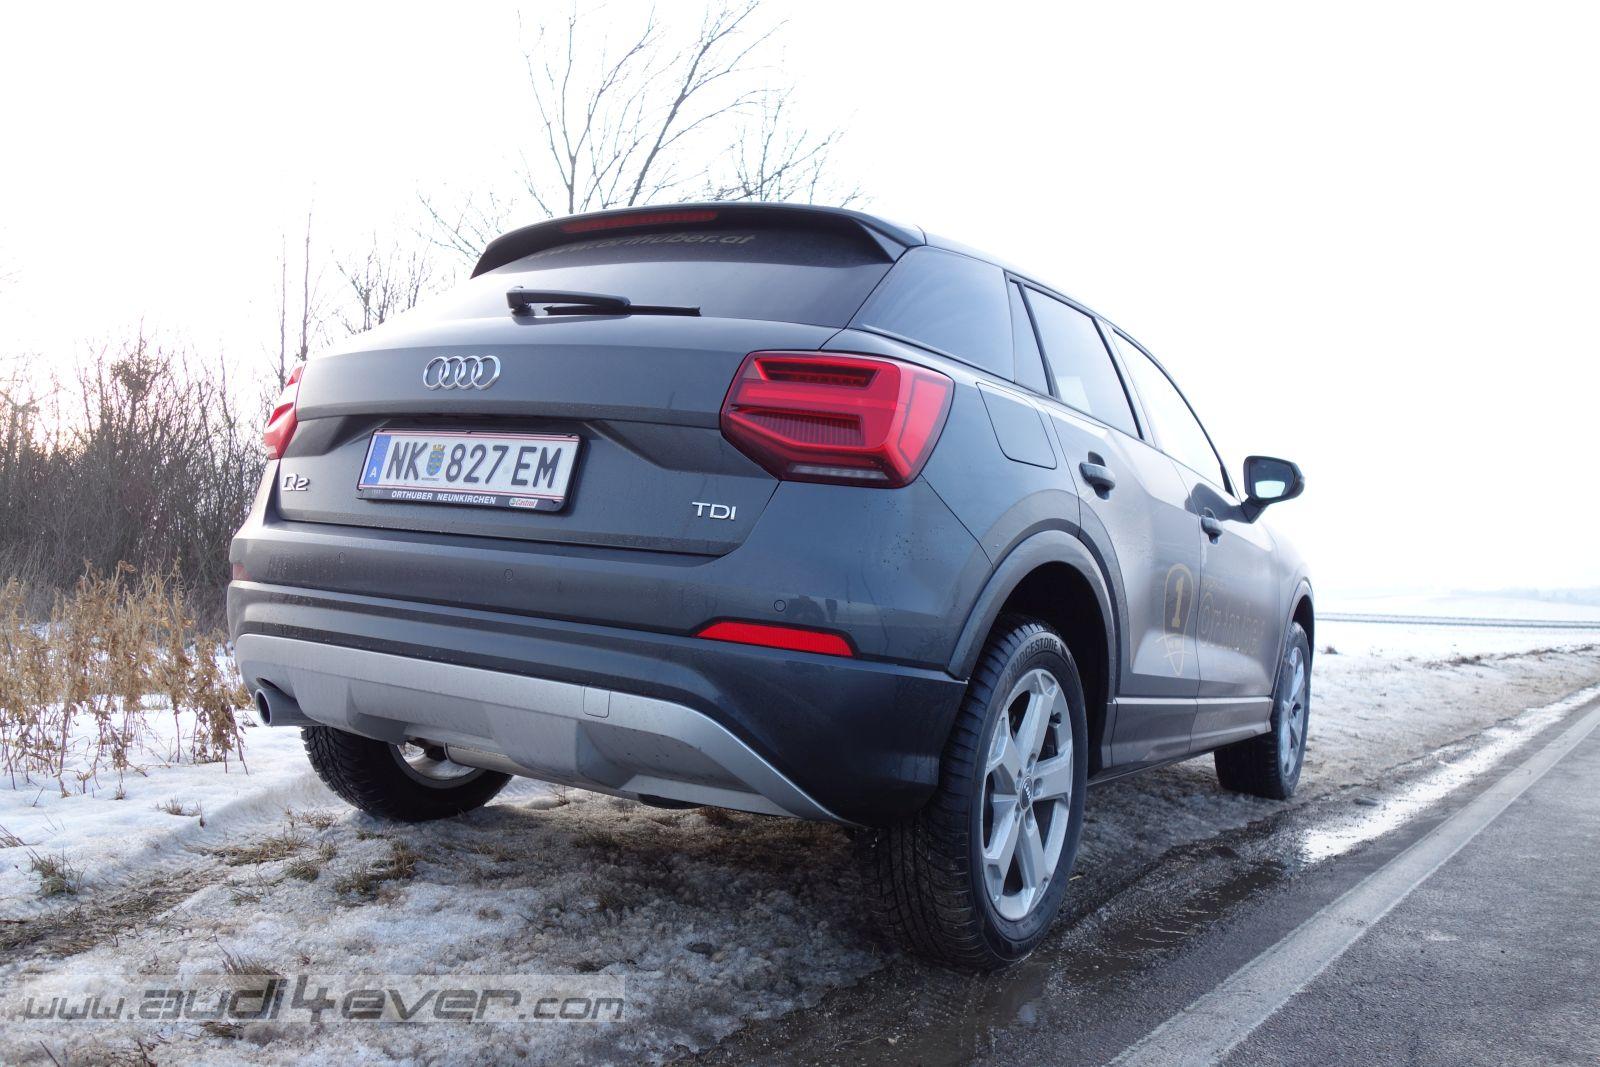 Audi Q2 Vergleichstest